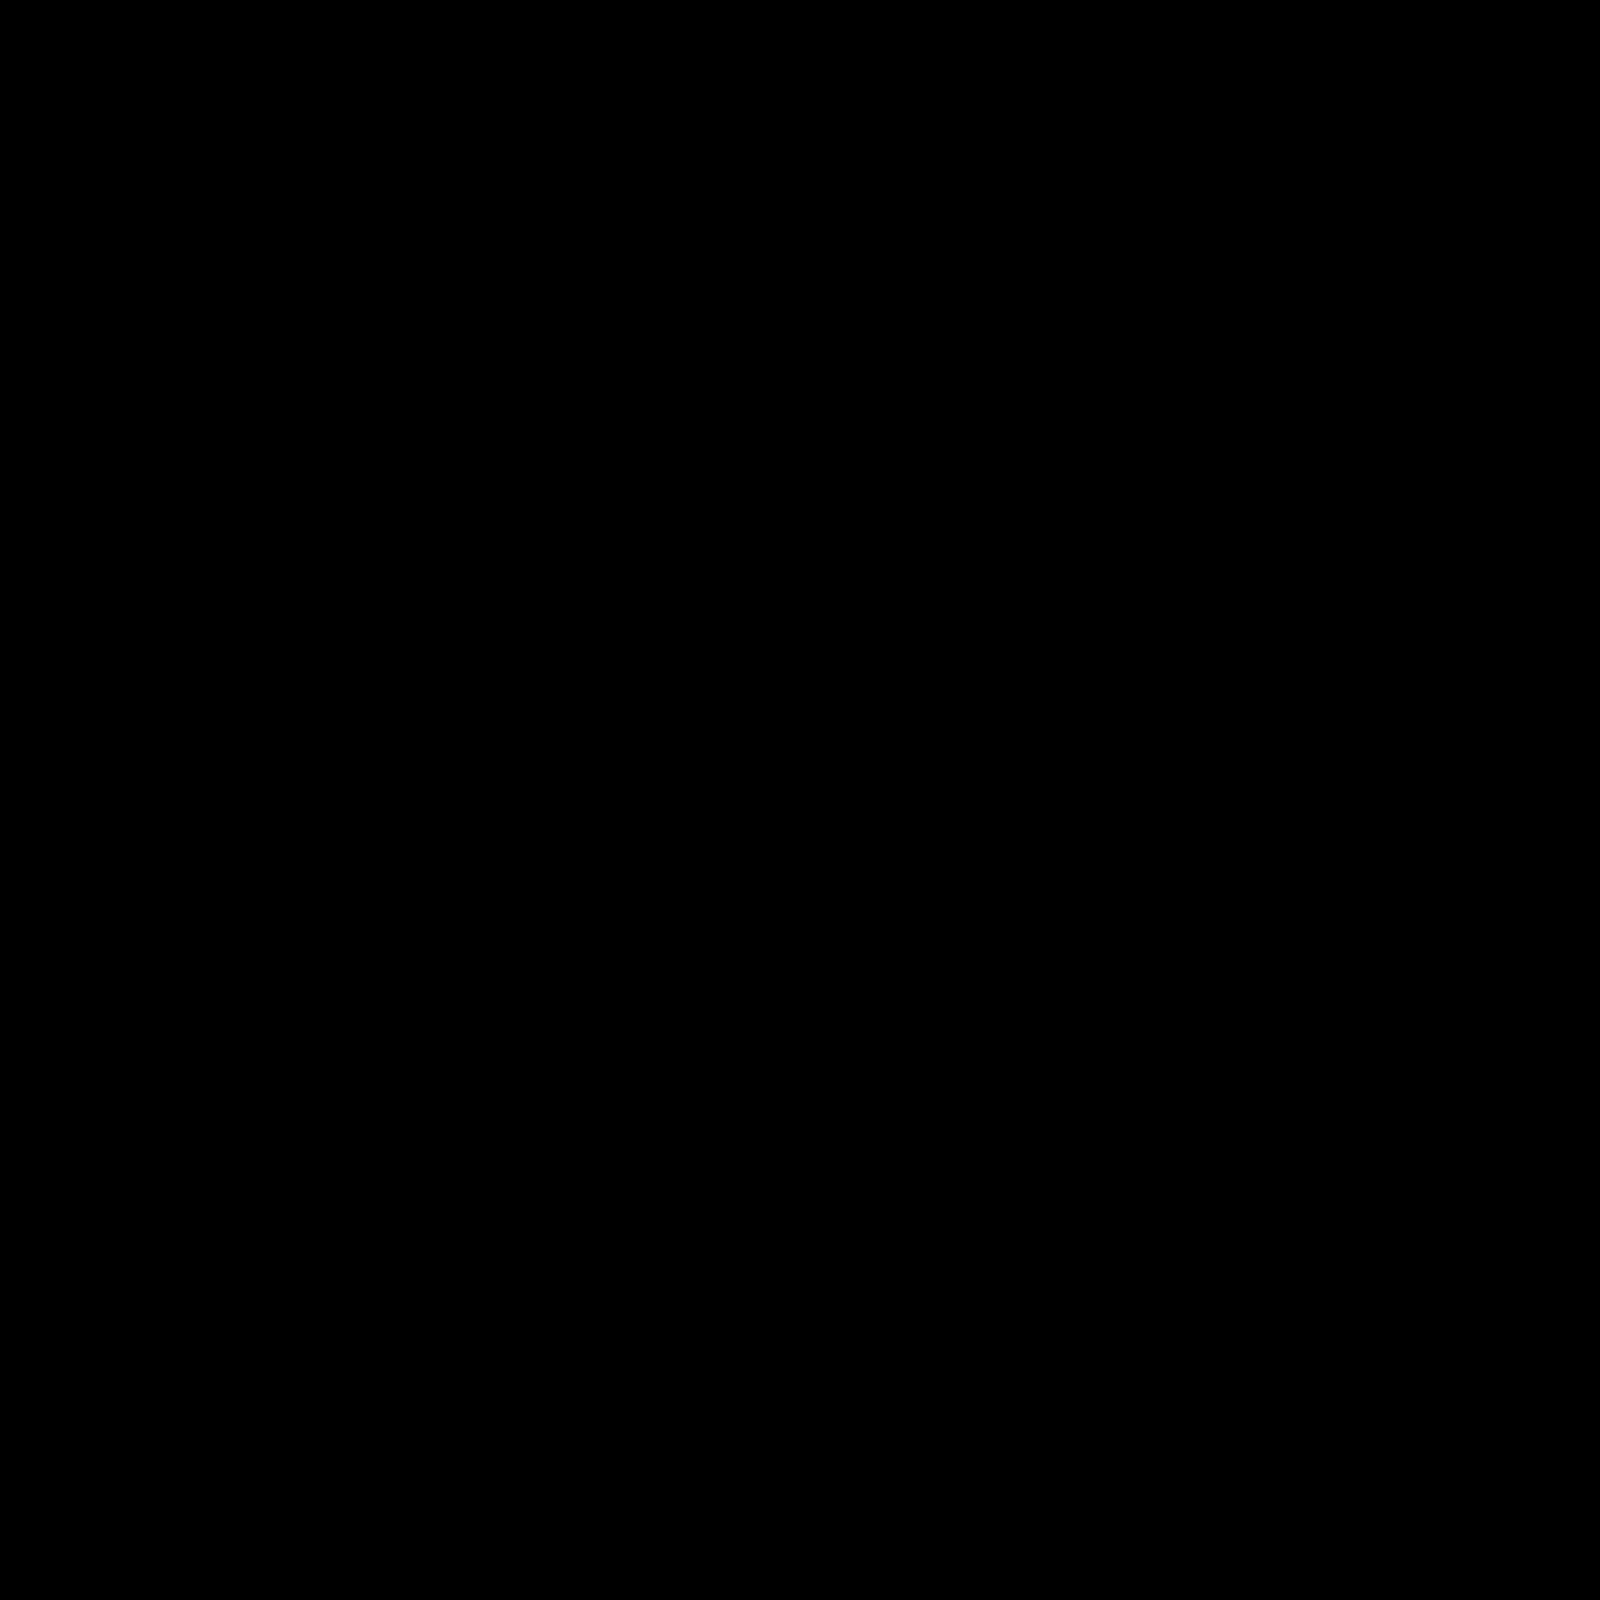 Front icon kostenloser download. Desk clipart vector school